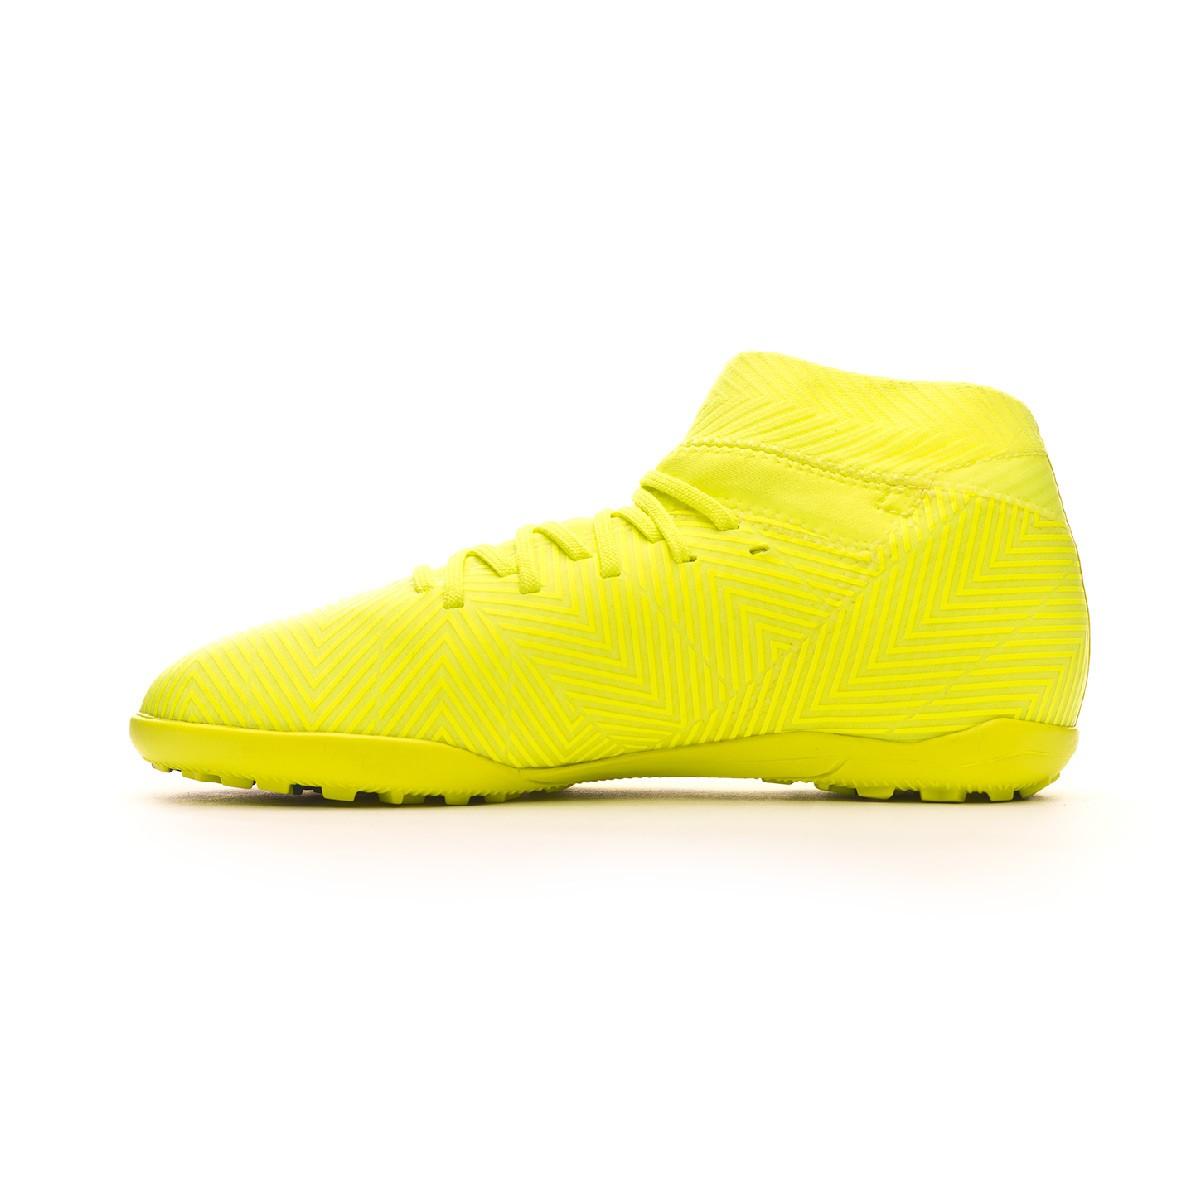 Chaussure de football adidas Nemeziz Tango 18.3 Turf enfant